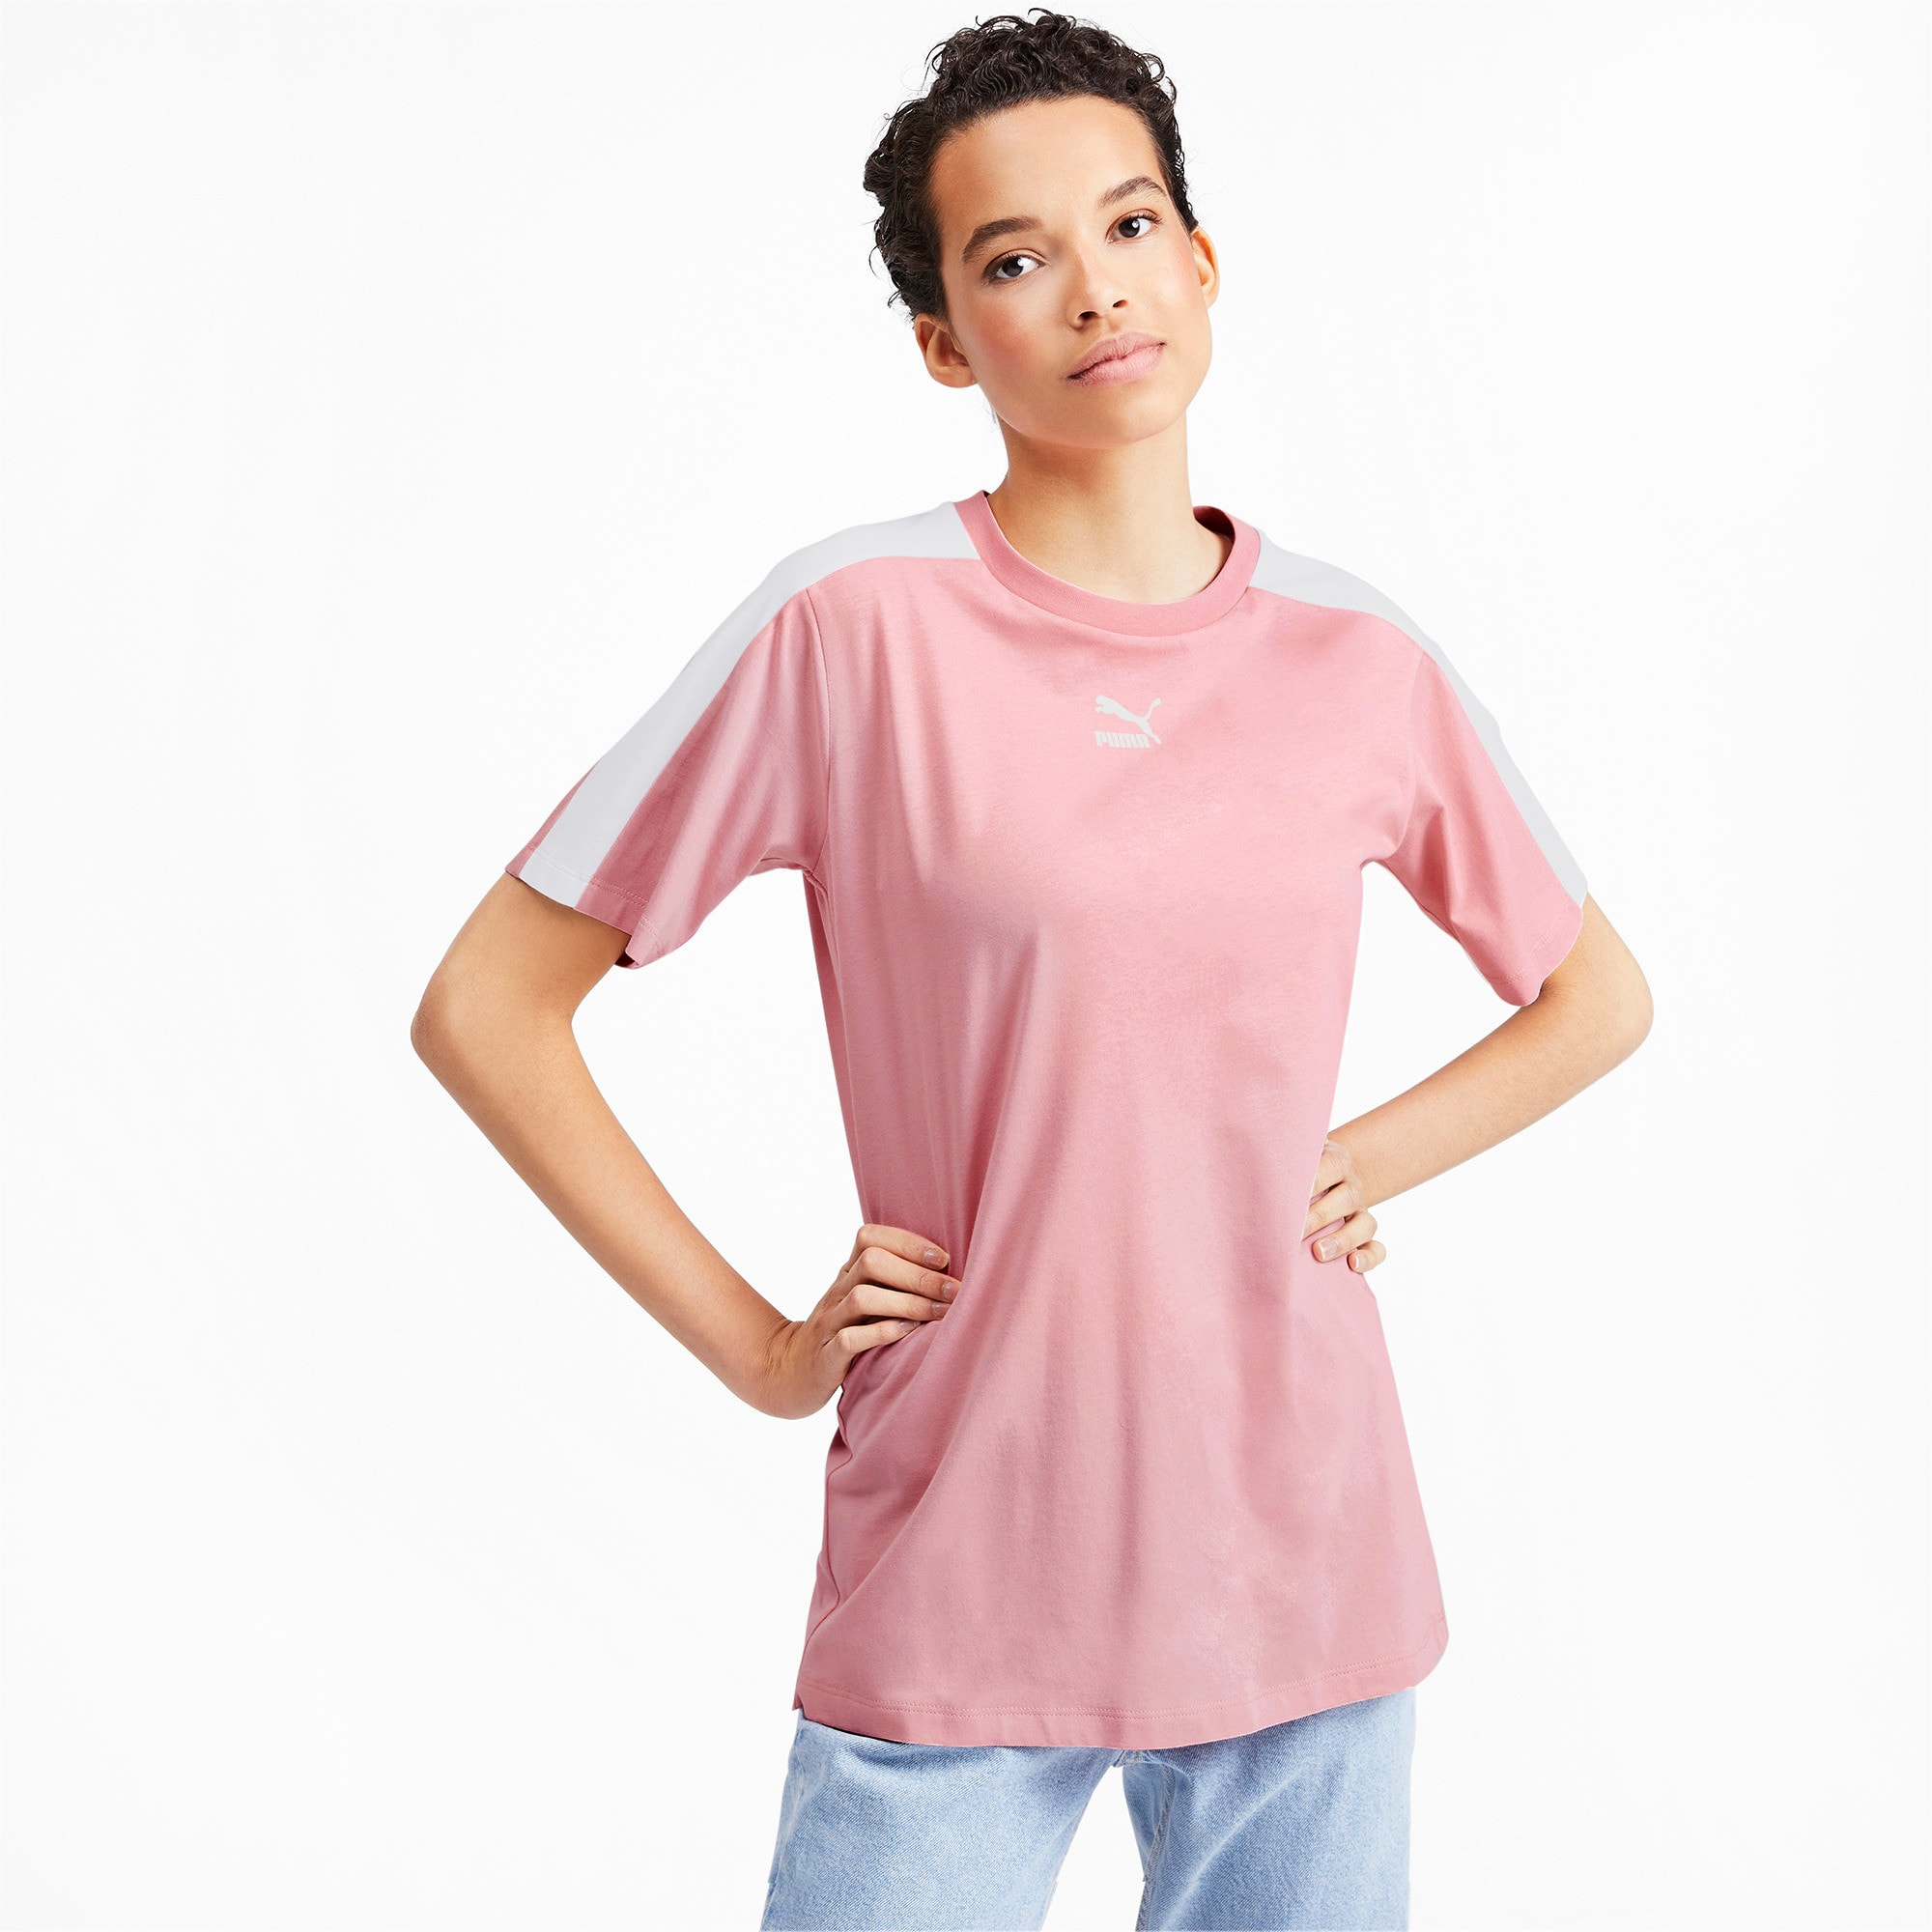 Miniatura 1 de Camiseta Classics T7 para mujer, Bridal Rose, mediano